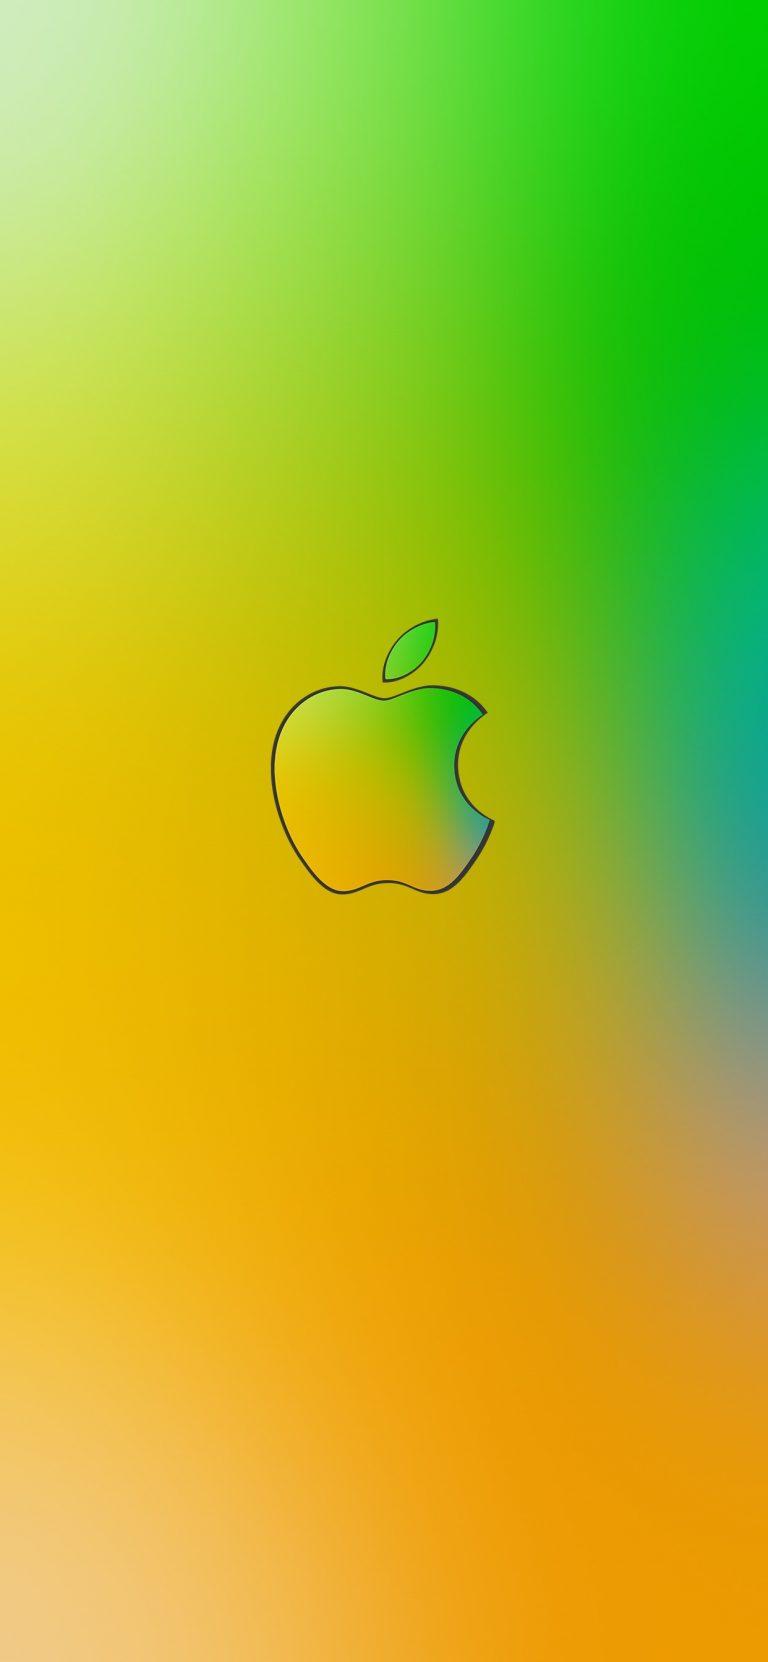 Apple Card Wallpaper 06 1242x2688 768x1662